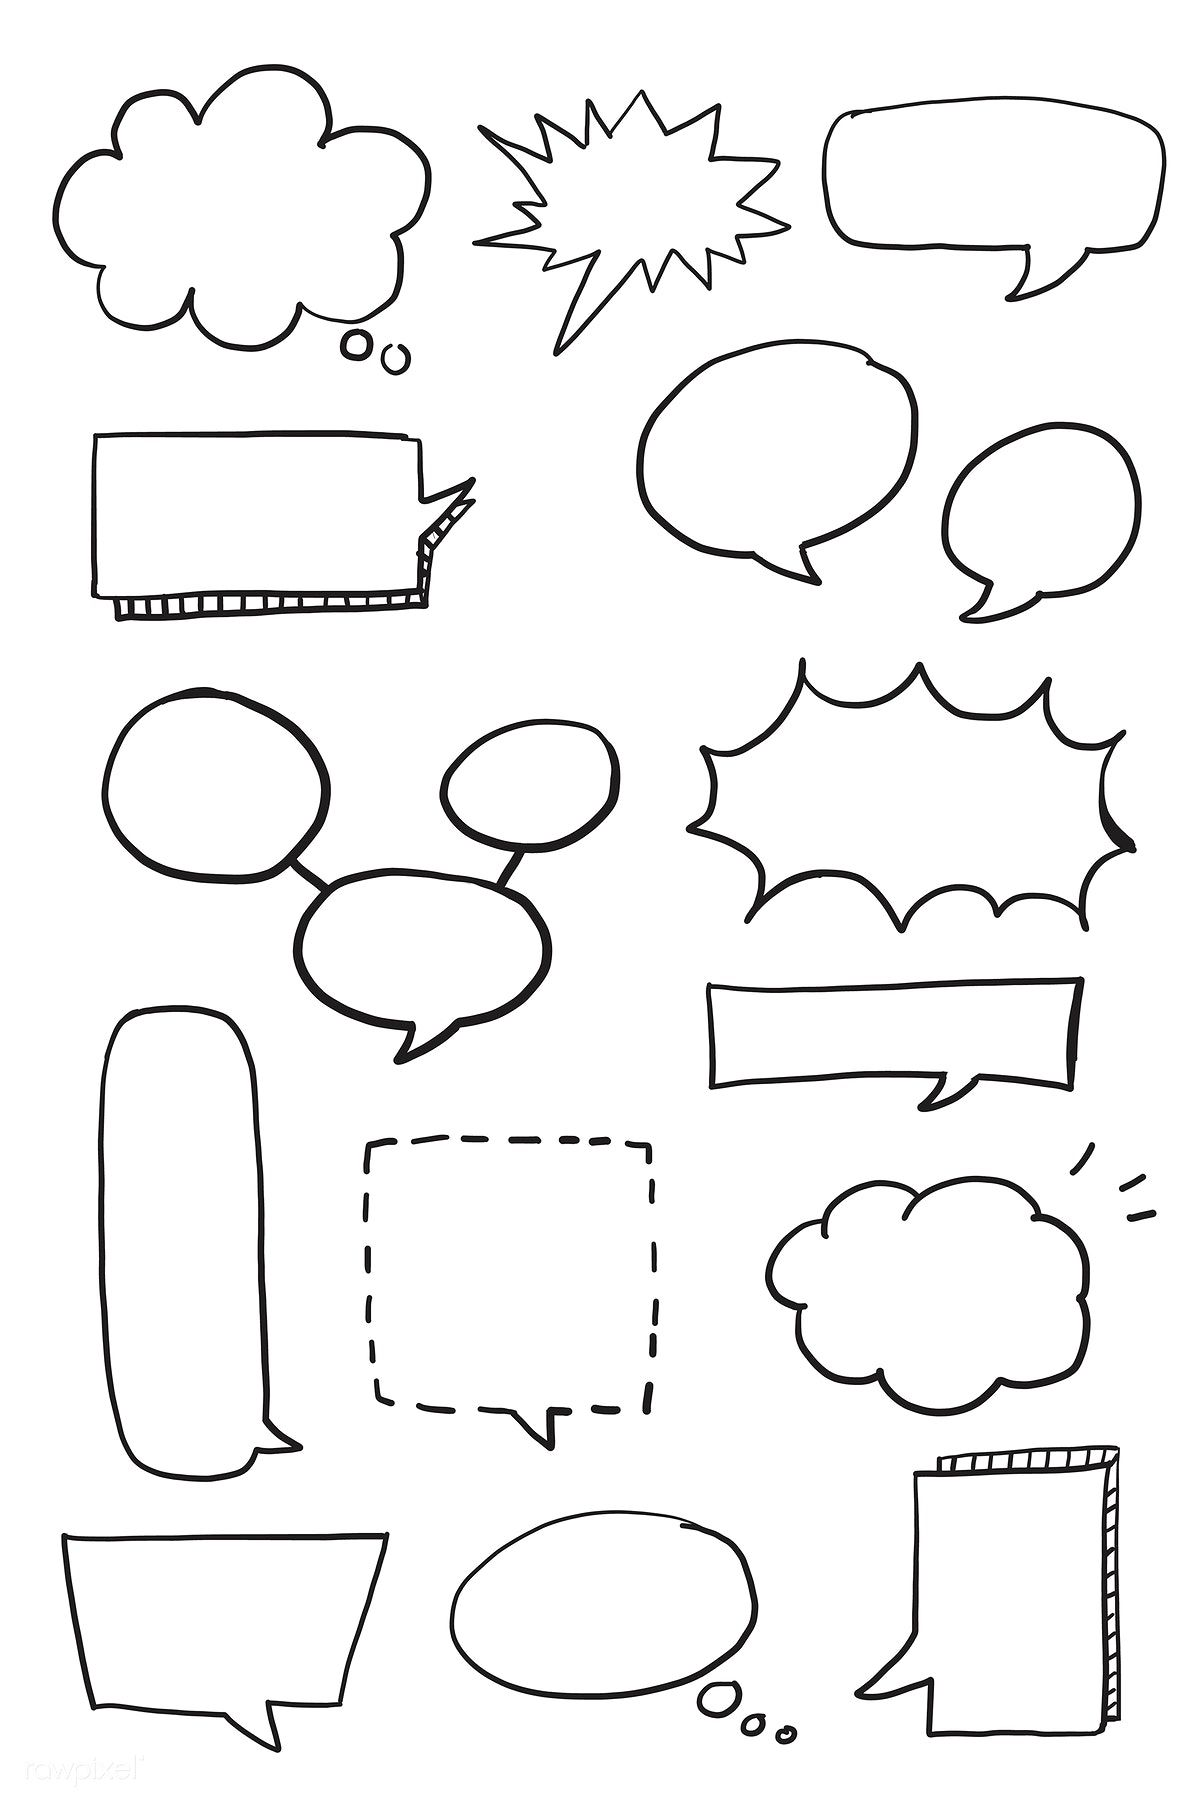 Download premium vector of Hand drawn speech bubble doodle